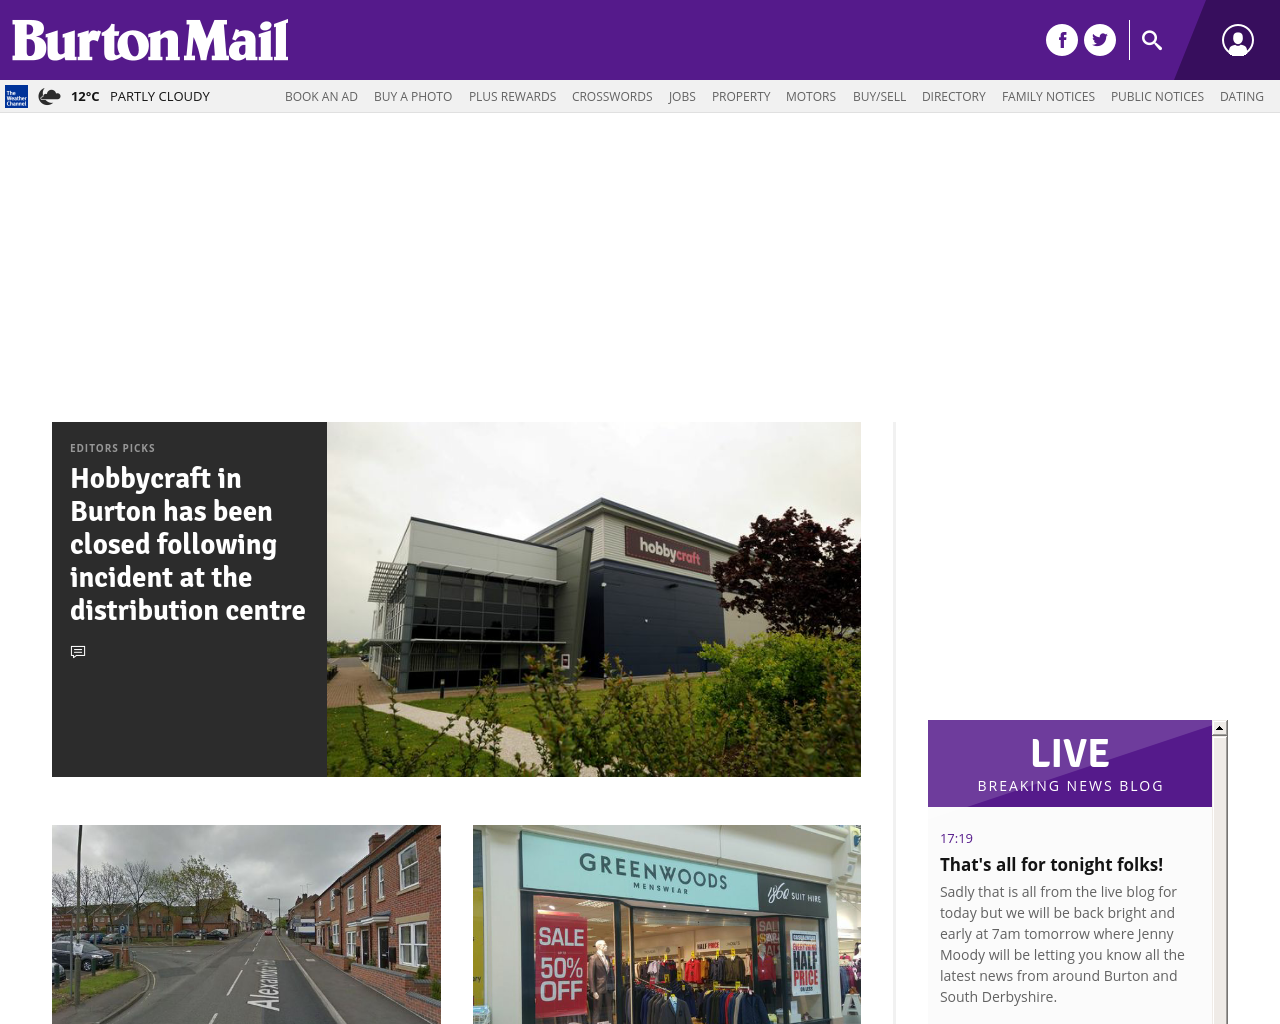 burton mail today